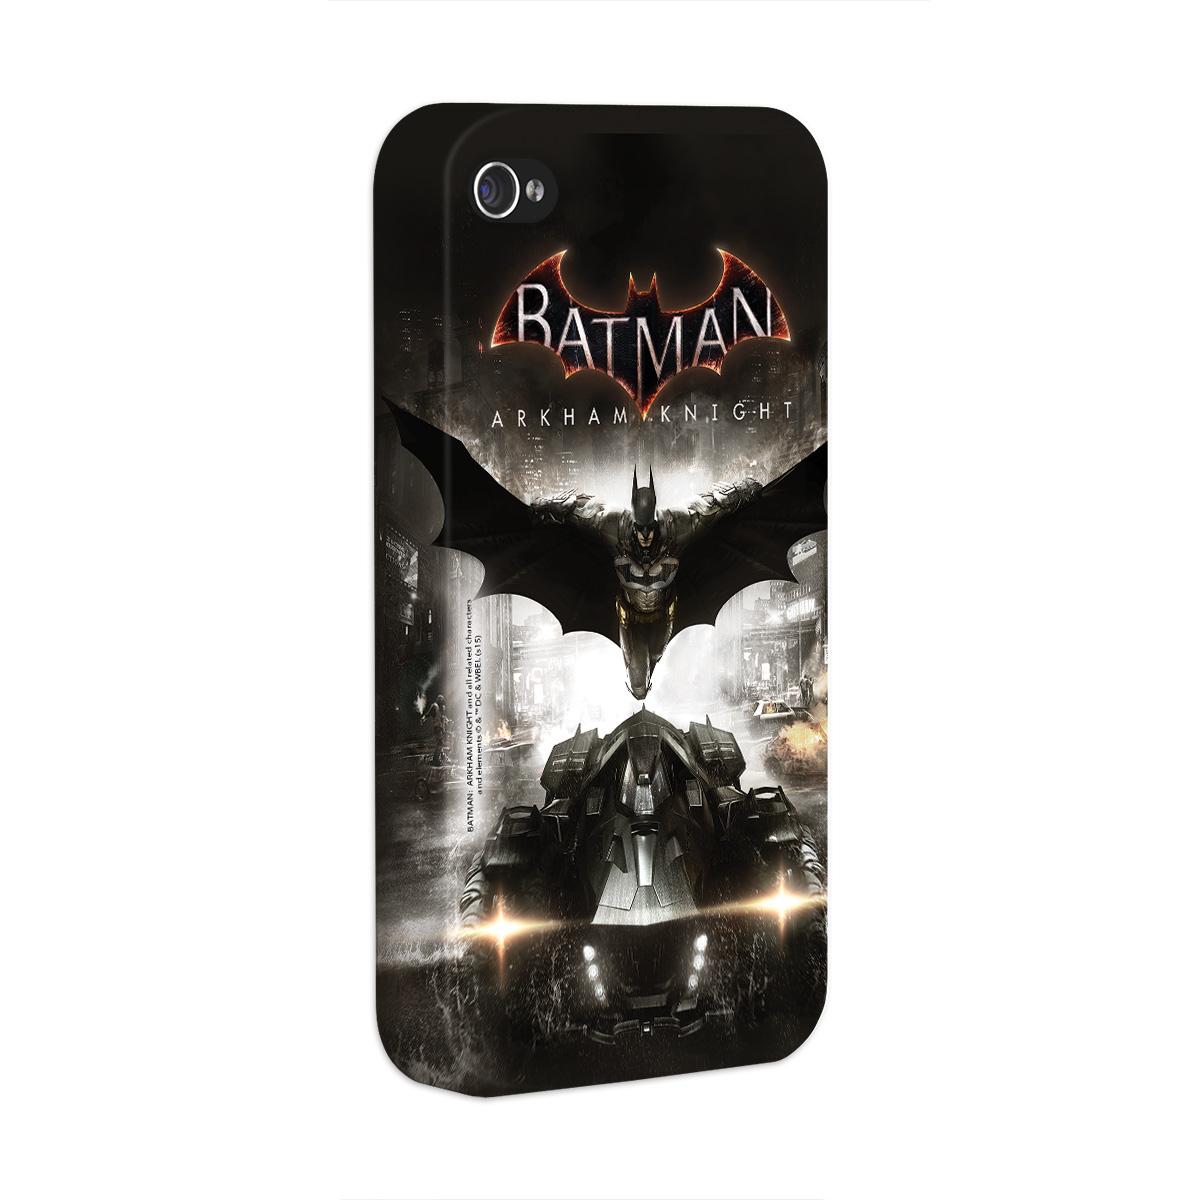 Capa para iPhone 4/4S Batman Arkham Knight Action  - bandUP Store Marketplace